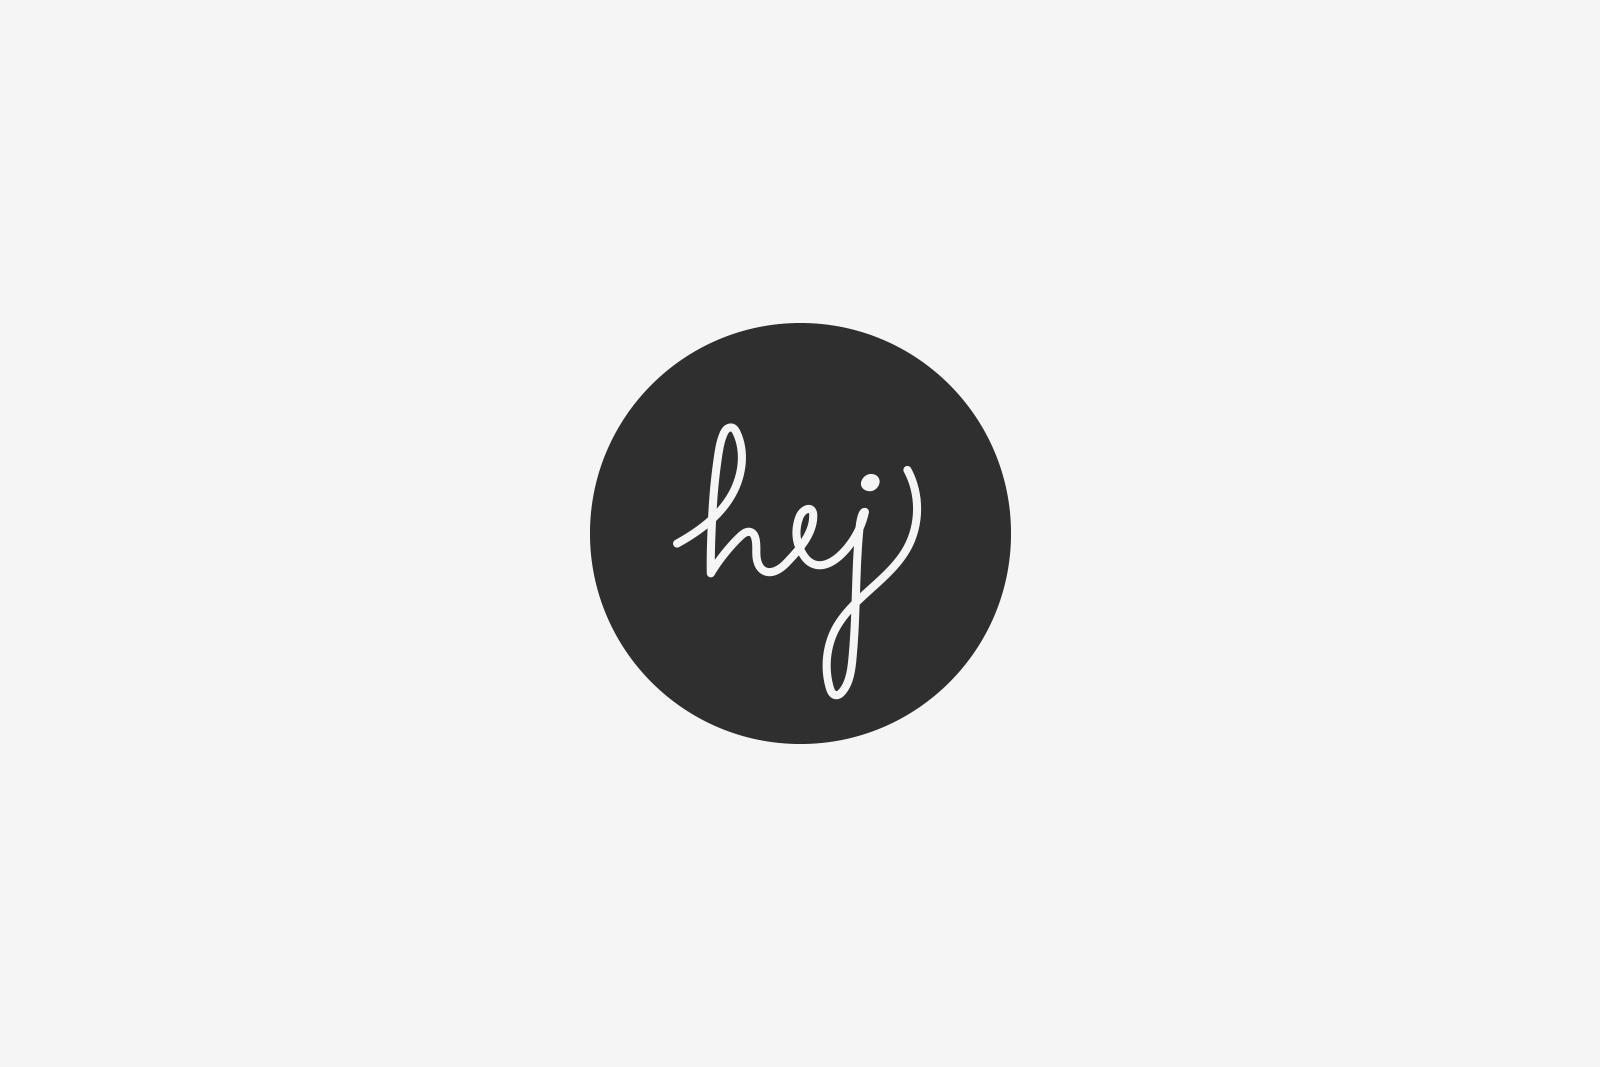 Logo Hej Bw